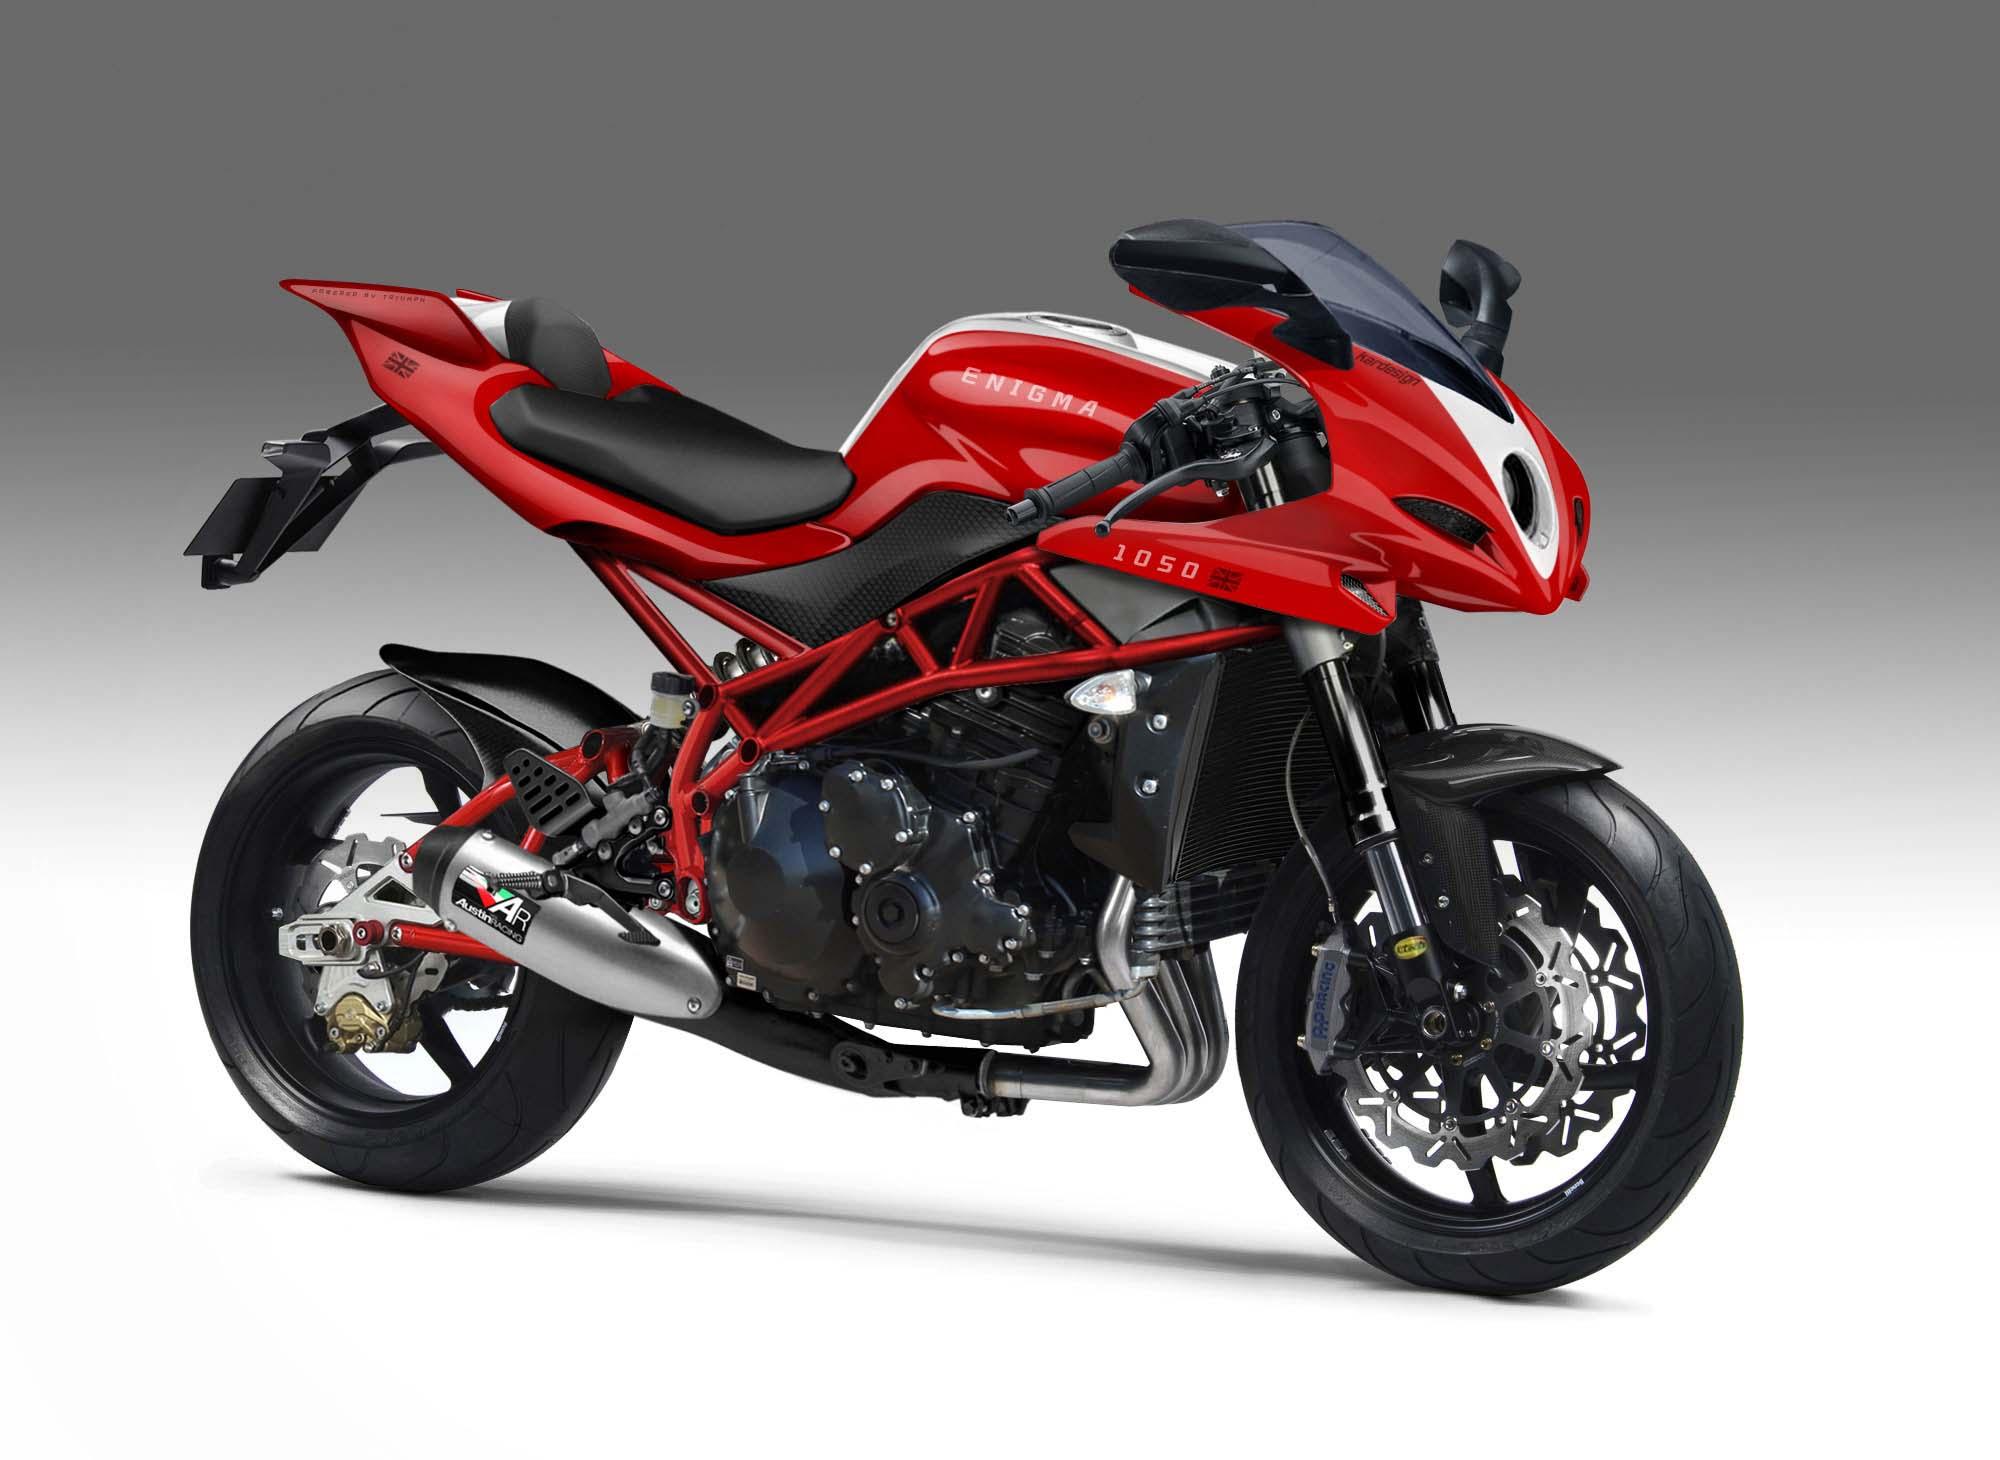 new 1050 motor based sport bike  enigma   triumph forum